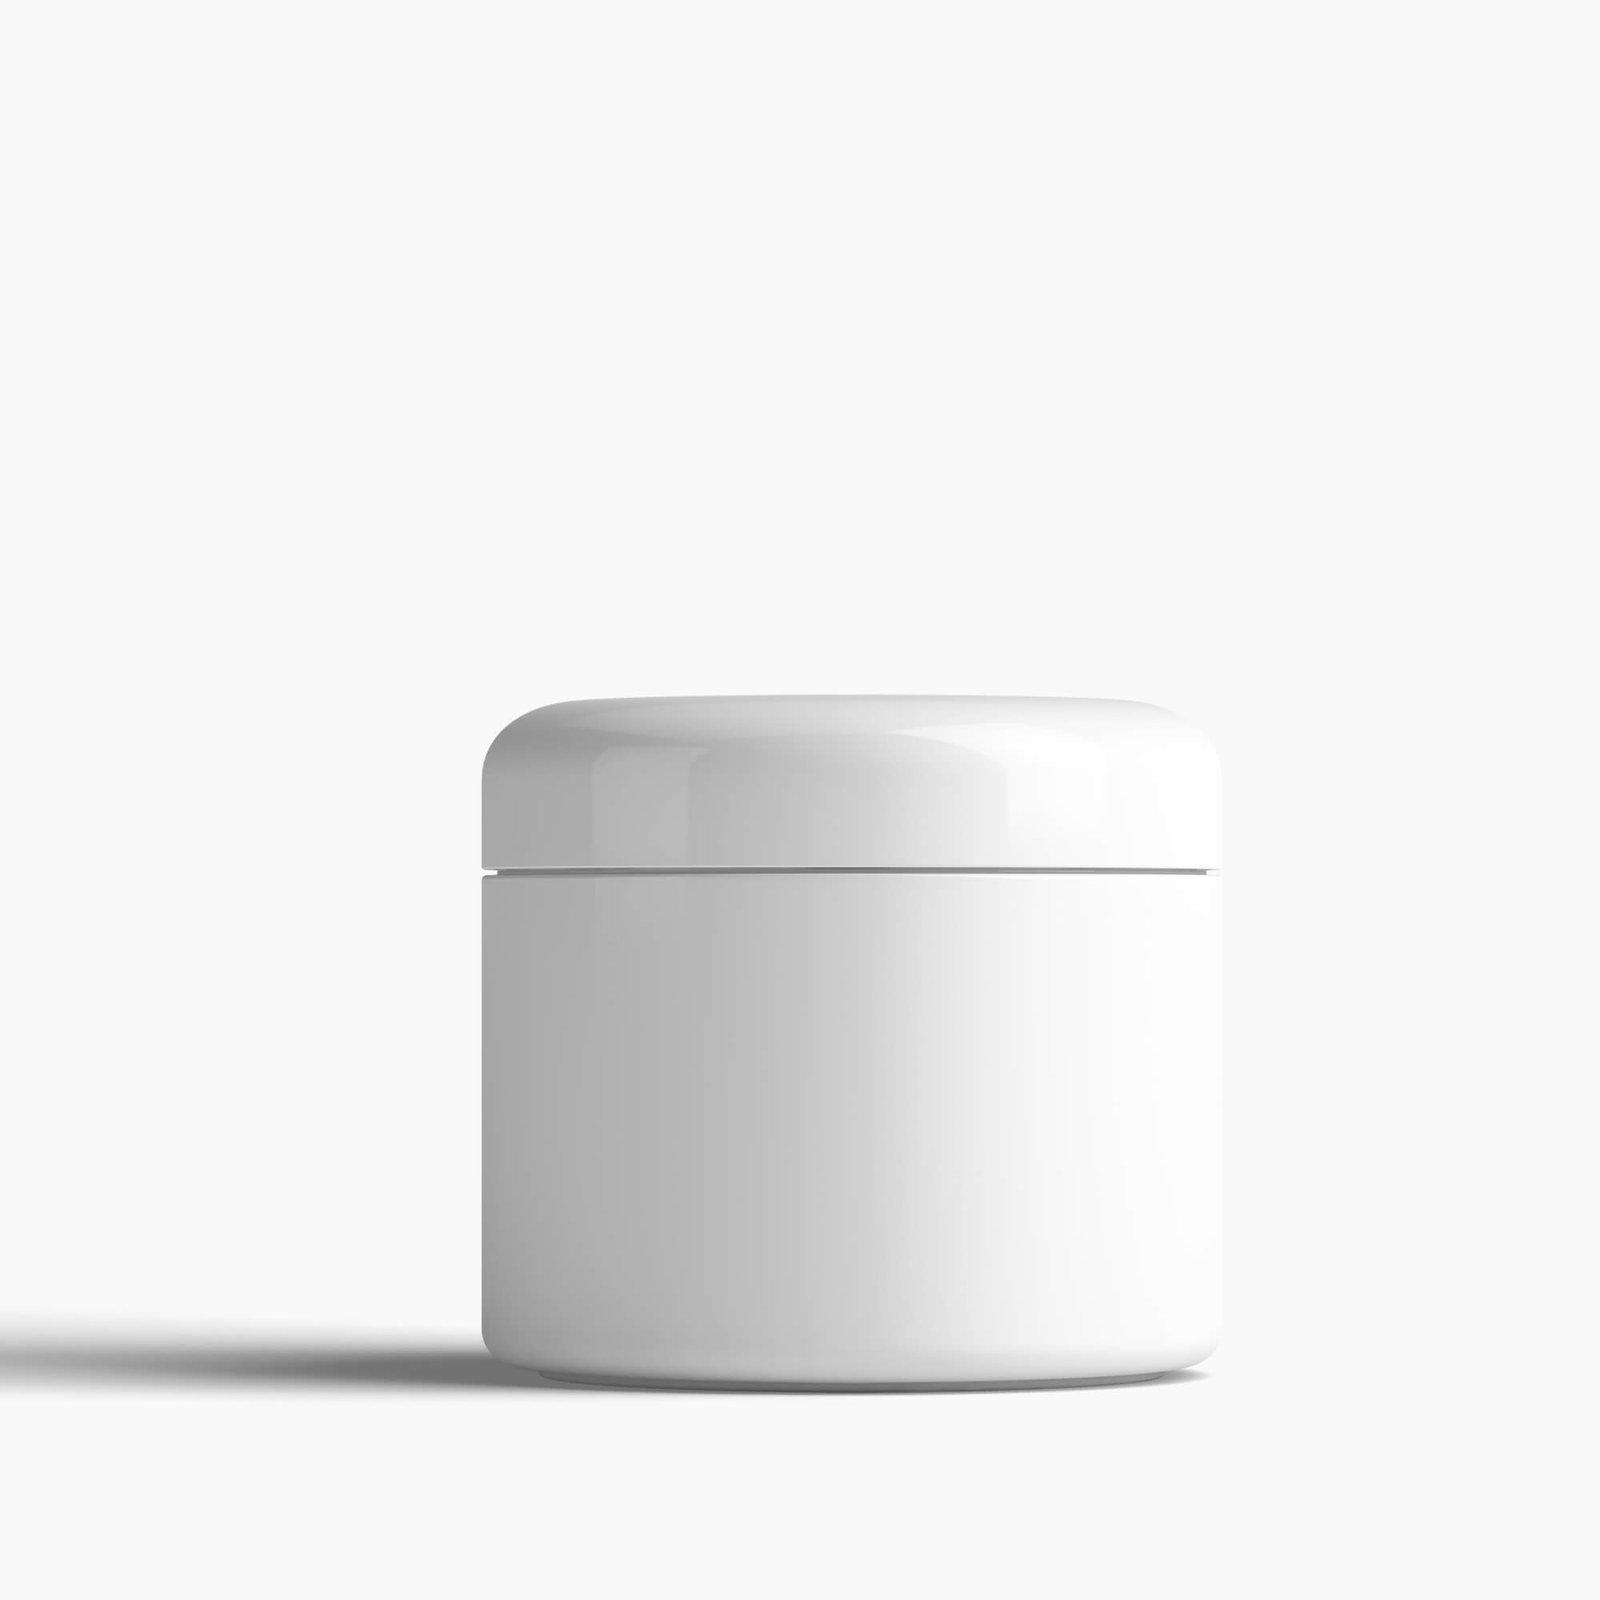 Blank Free Cream Mockup PSD Template